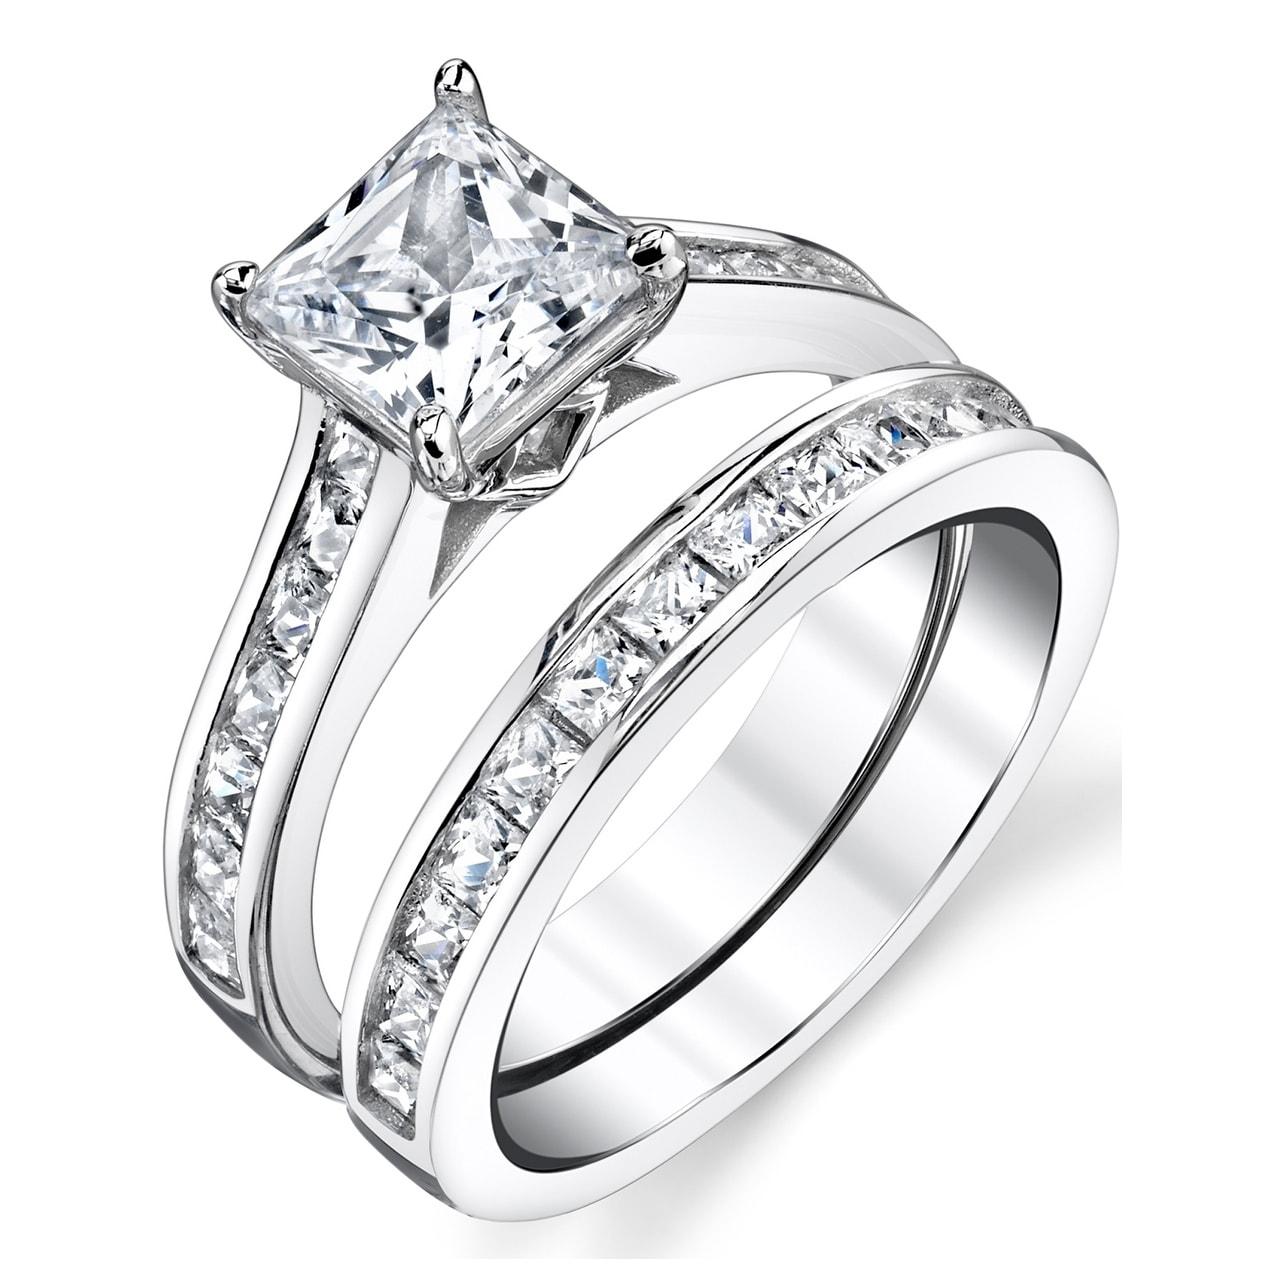 Shop Oliveti Sterling Silver Princess Cut Engagement Ring Bridal Set